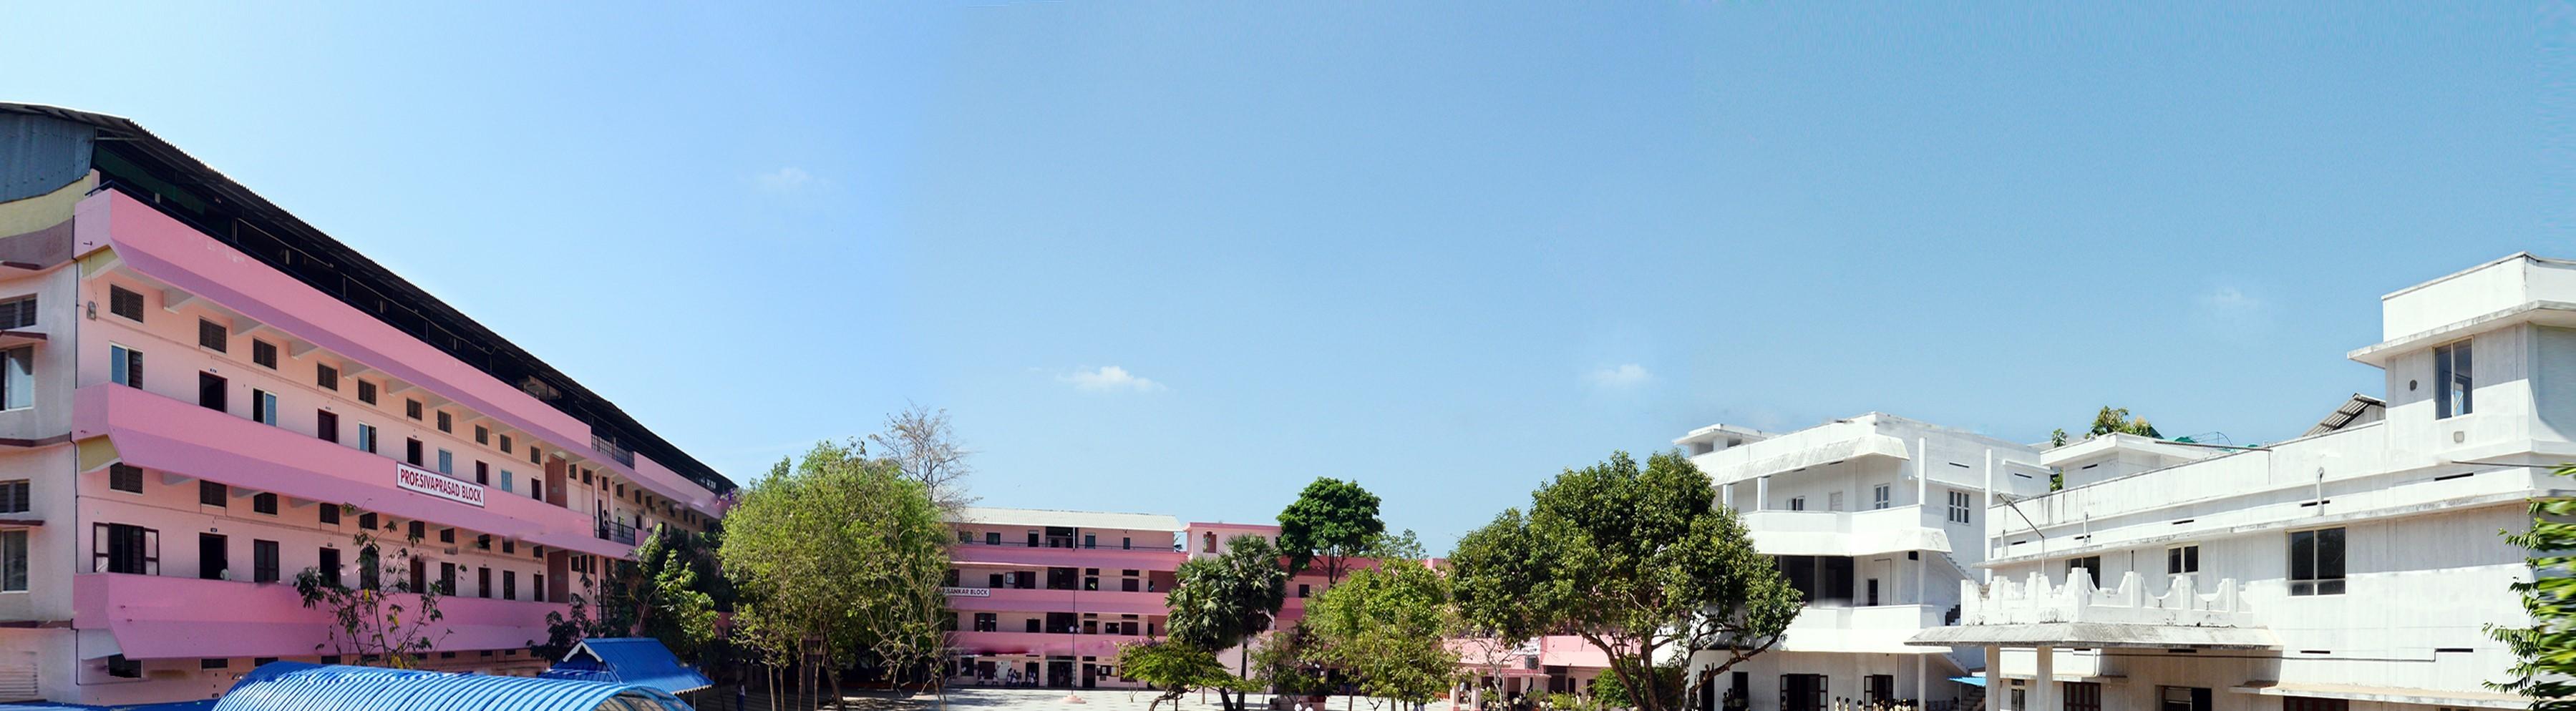 Sree Narayana Public School